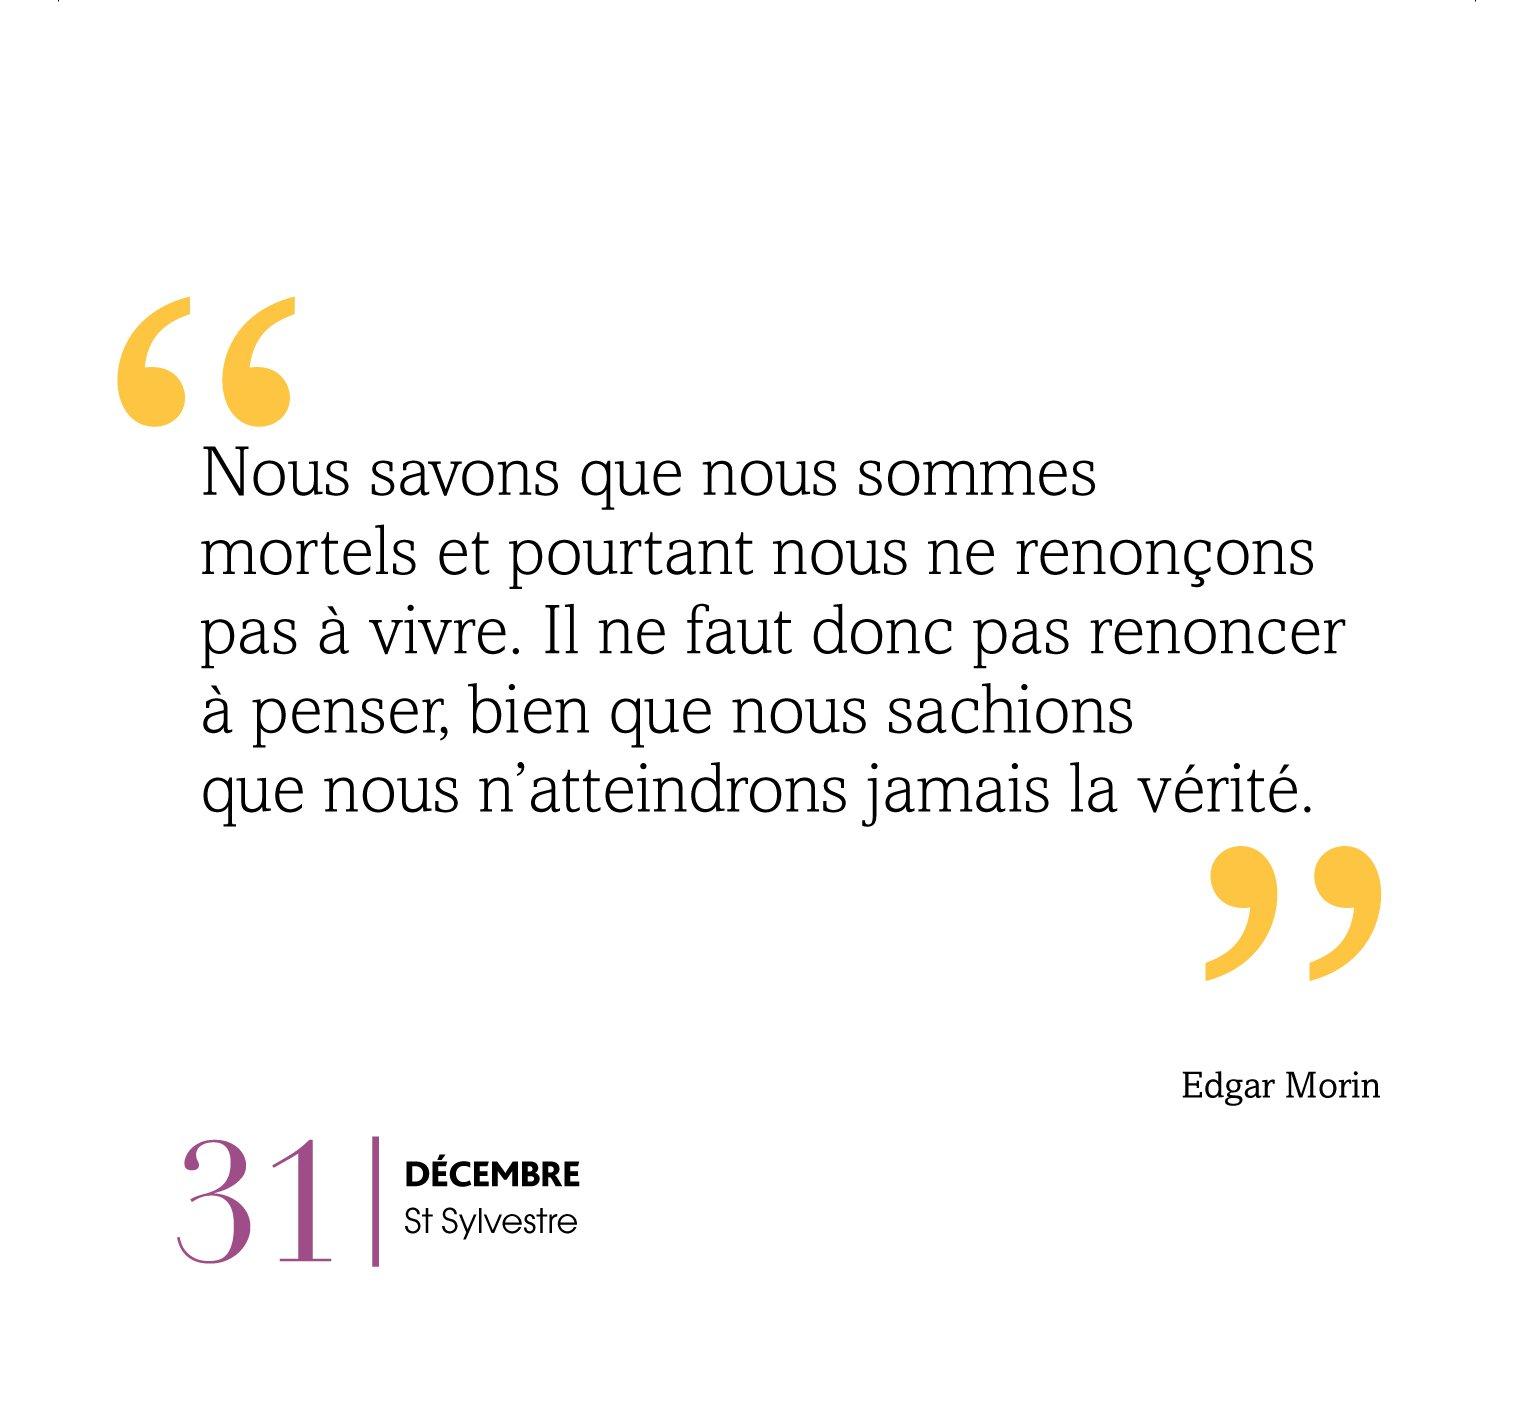 Calendrier Edgar Morin Mieux Penser Maintenant 9782809649826